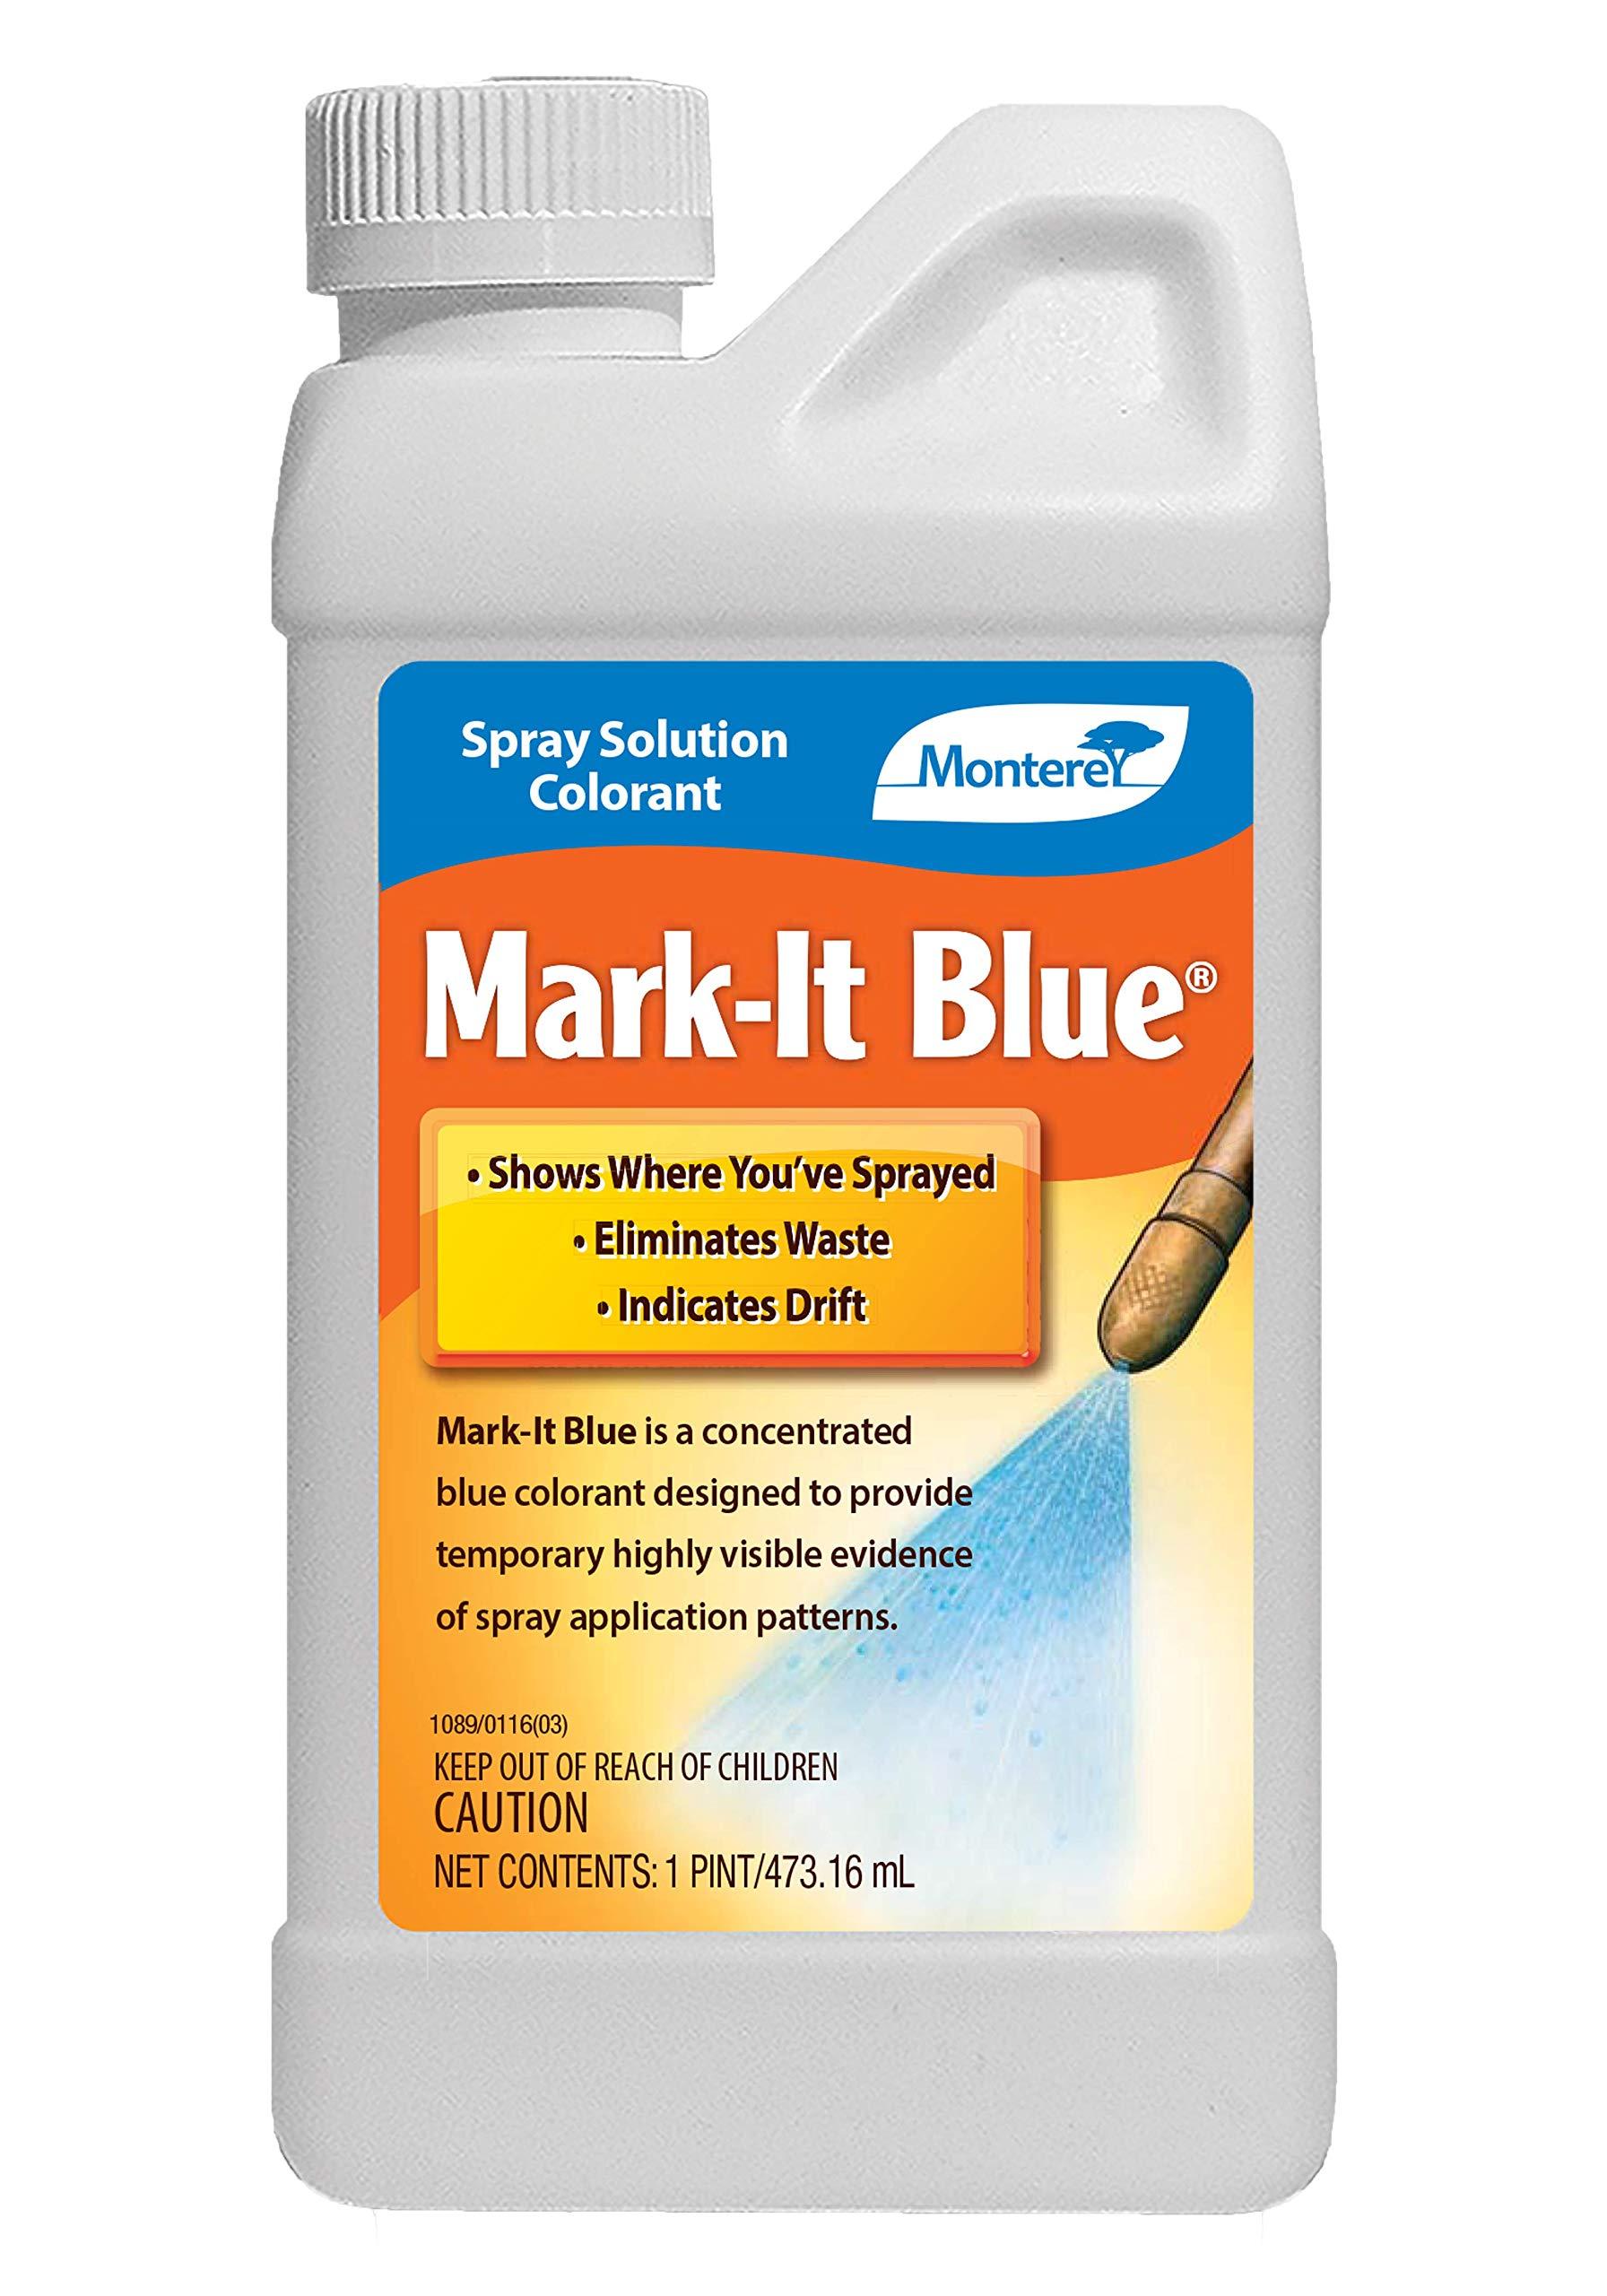 Monterey LG1142 Spray Solution Colorant Mark-It Blue Dye, 16 oz, White